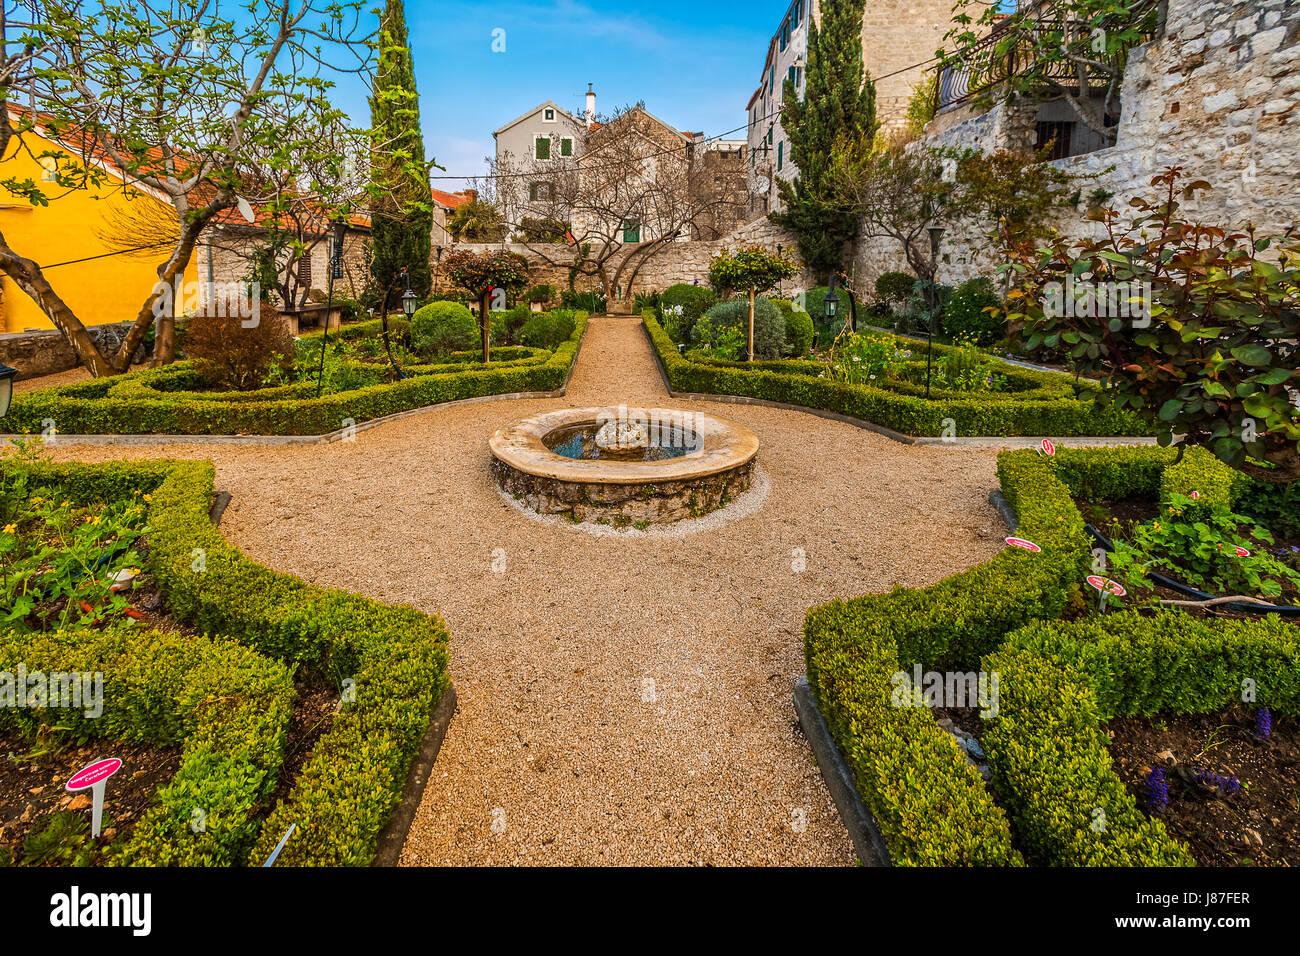 Croatia Dalmatia Sibenik - Gorica -Medieval Garden of the Convent of ...